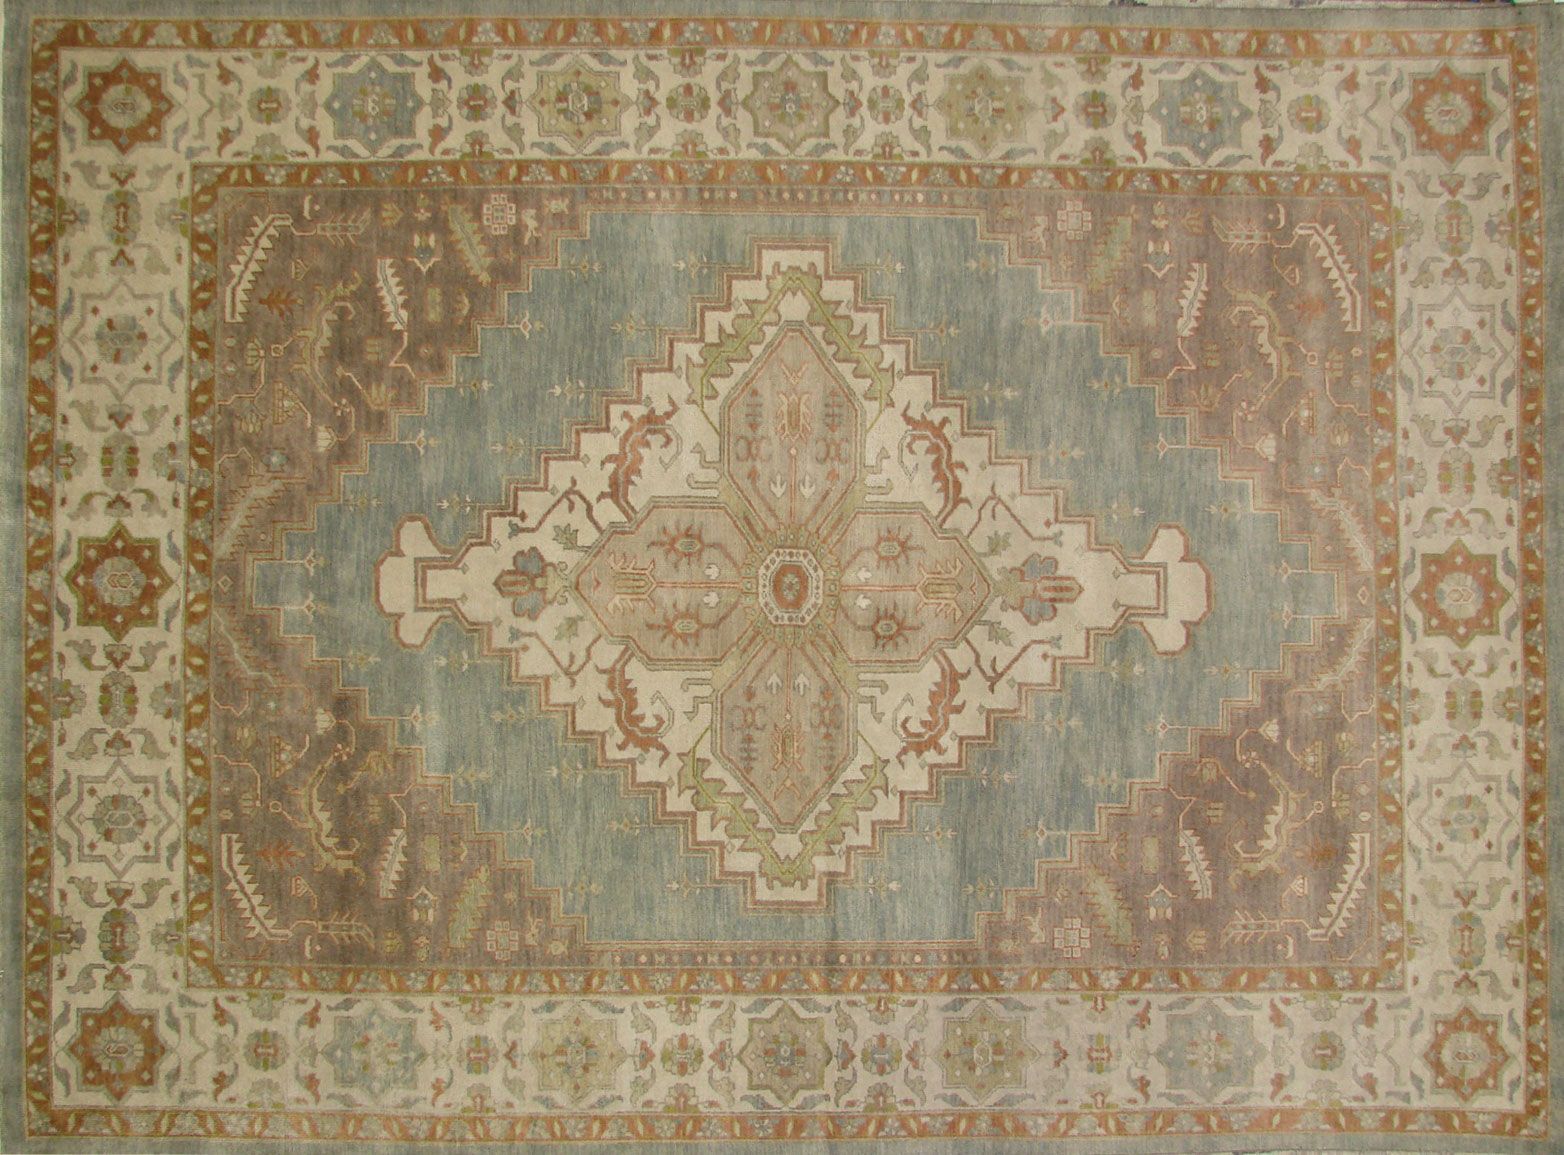 9x12 Heriz/Serapi Hand Knotted Wool Area Rug - MR18548